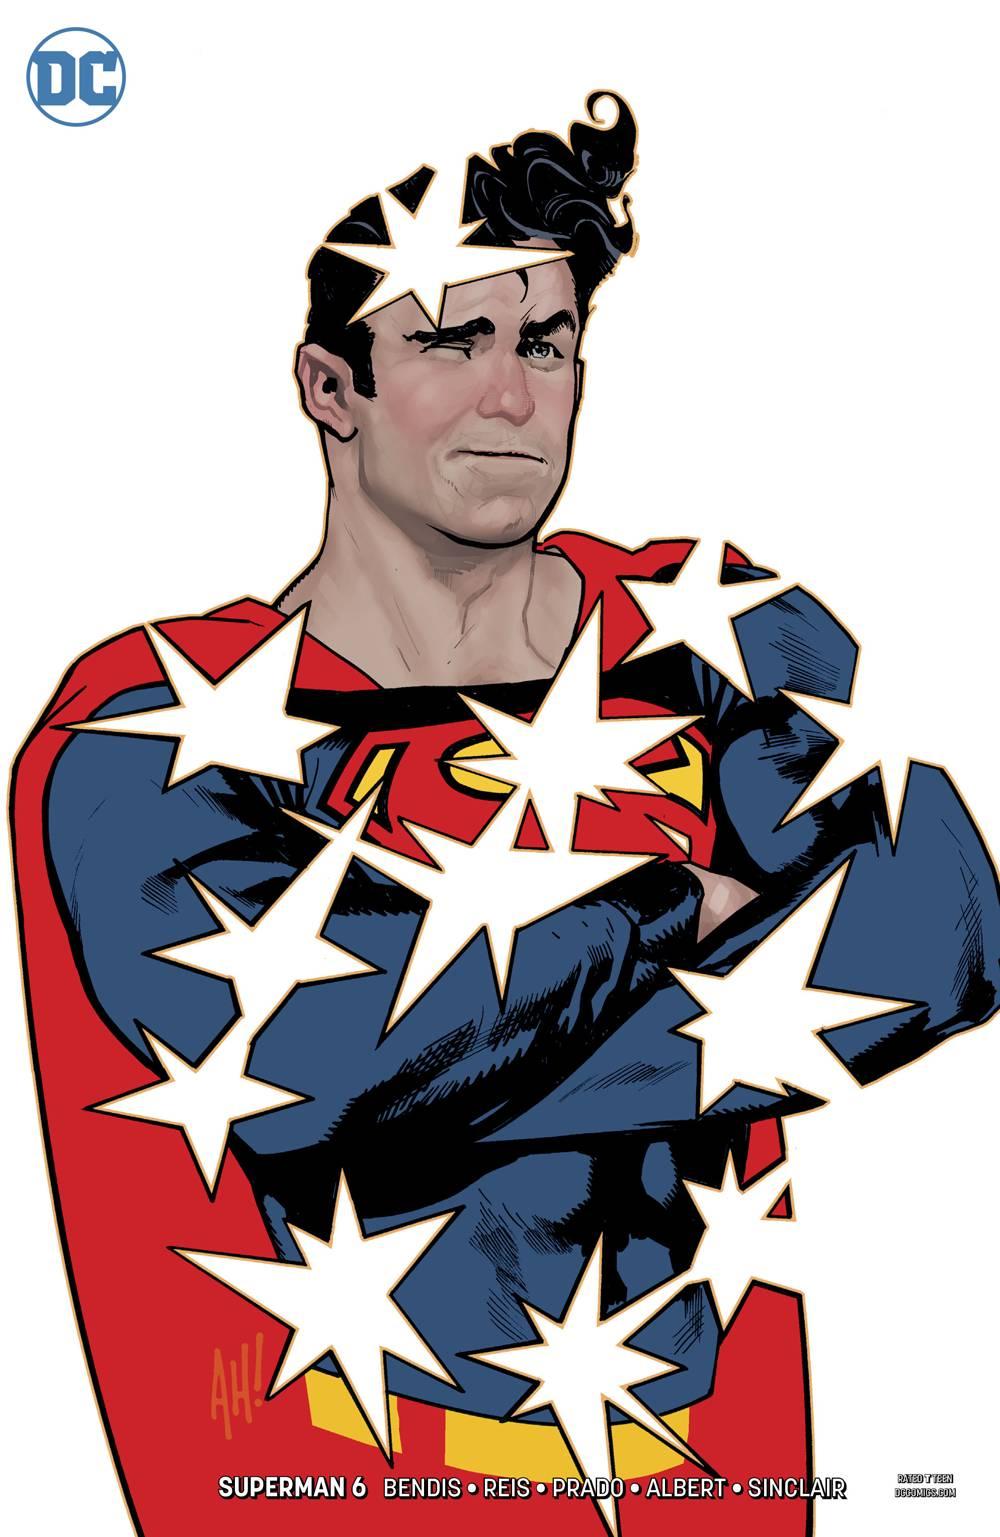 SUPERMAN #6 ADAM HUGHES VARIANT EDITION BY DC COMICS